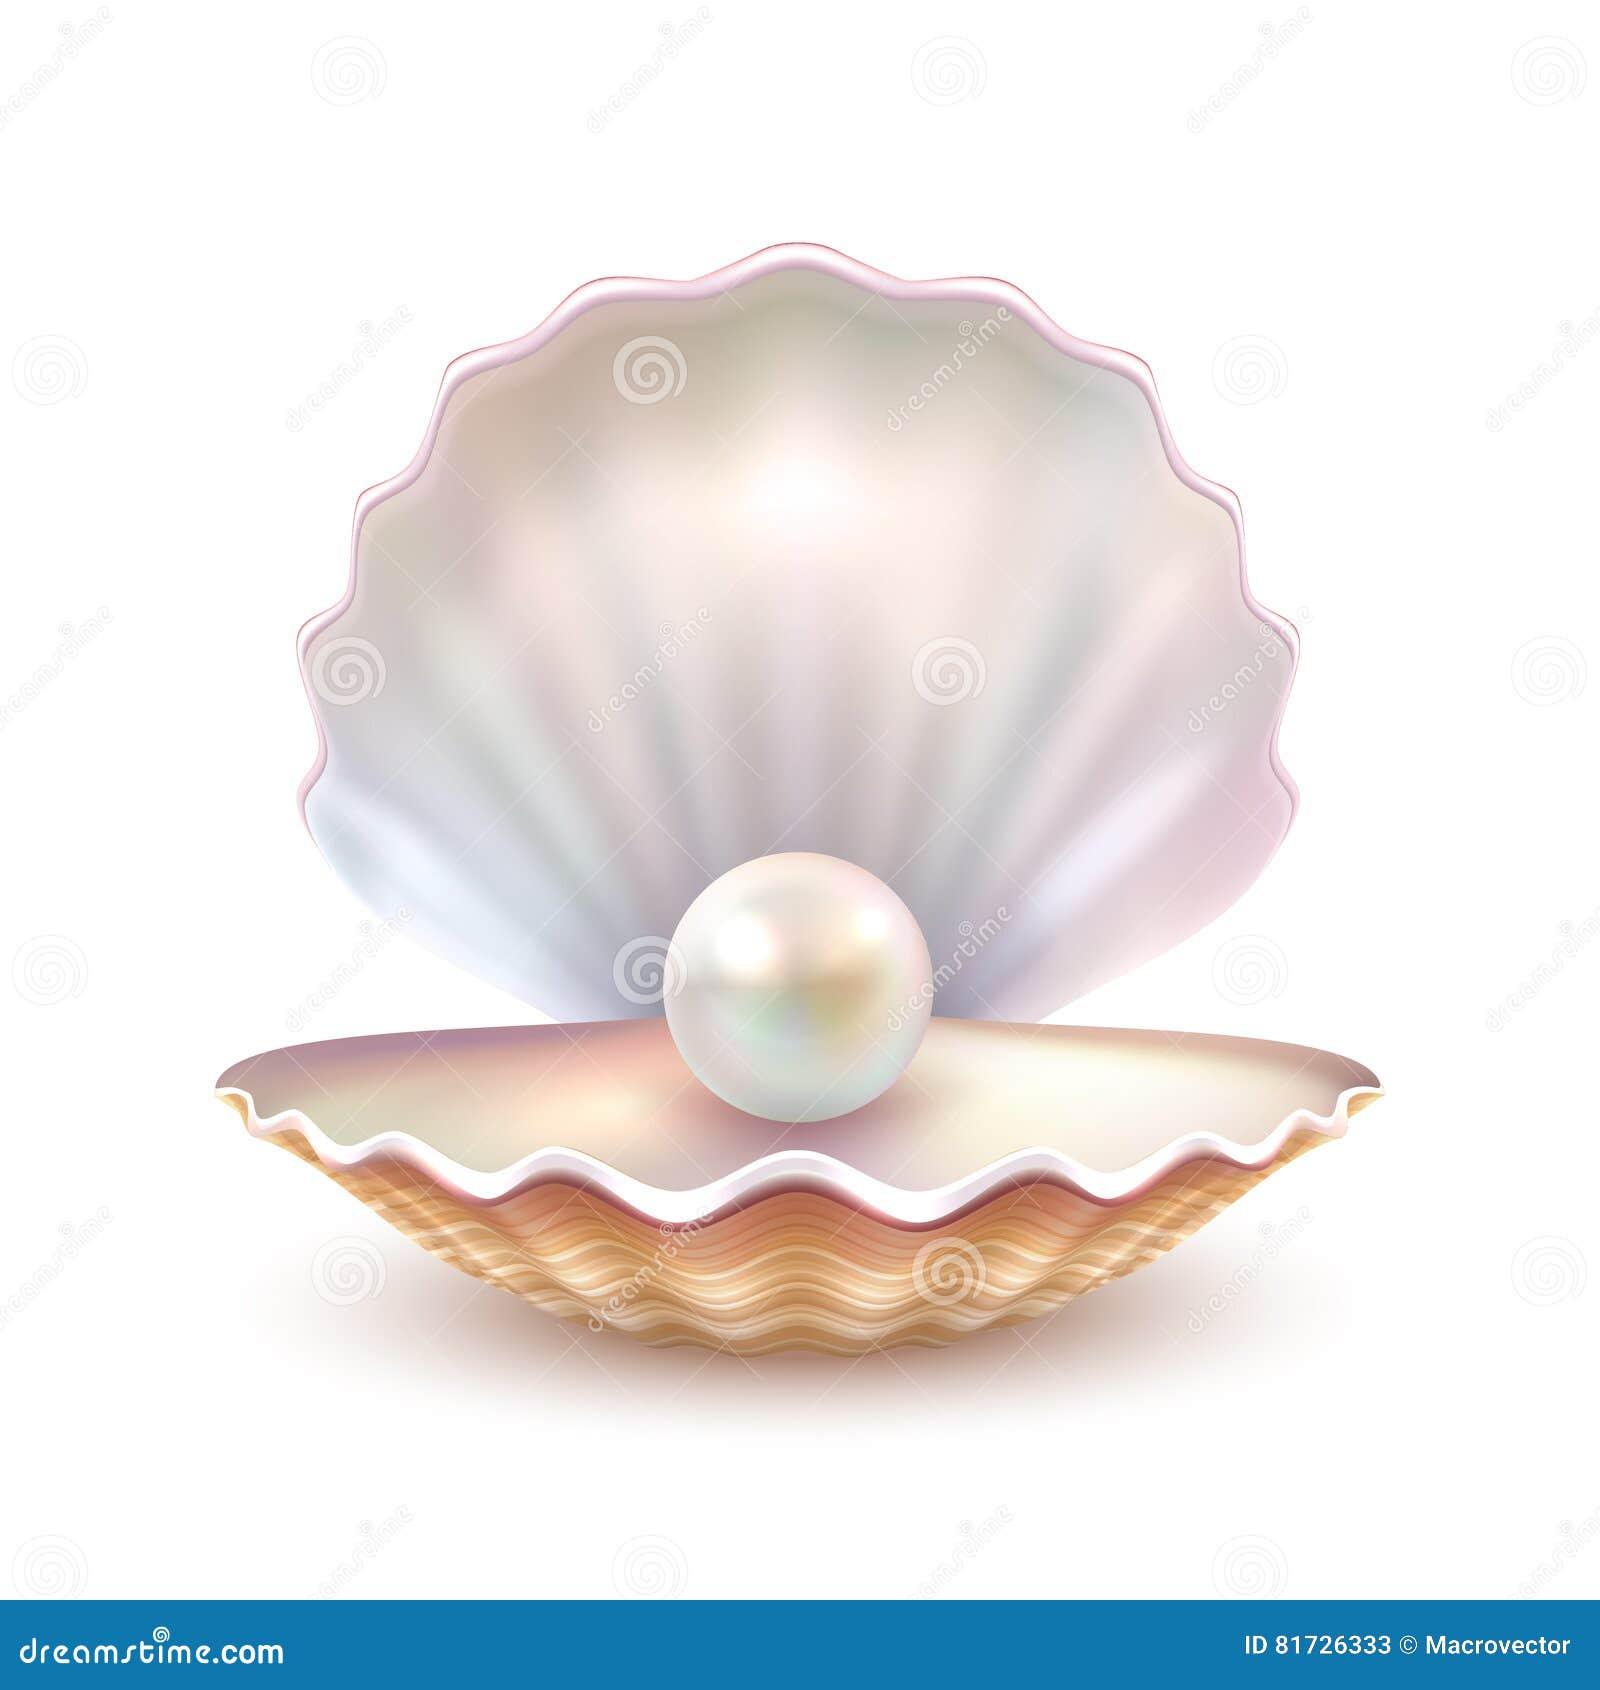 Pärlemorfärg Shell Realistic Close Up Image